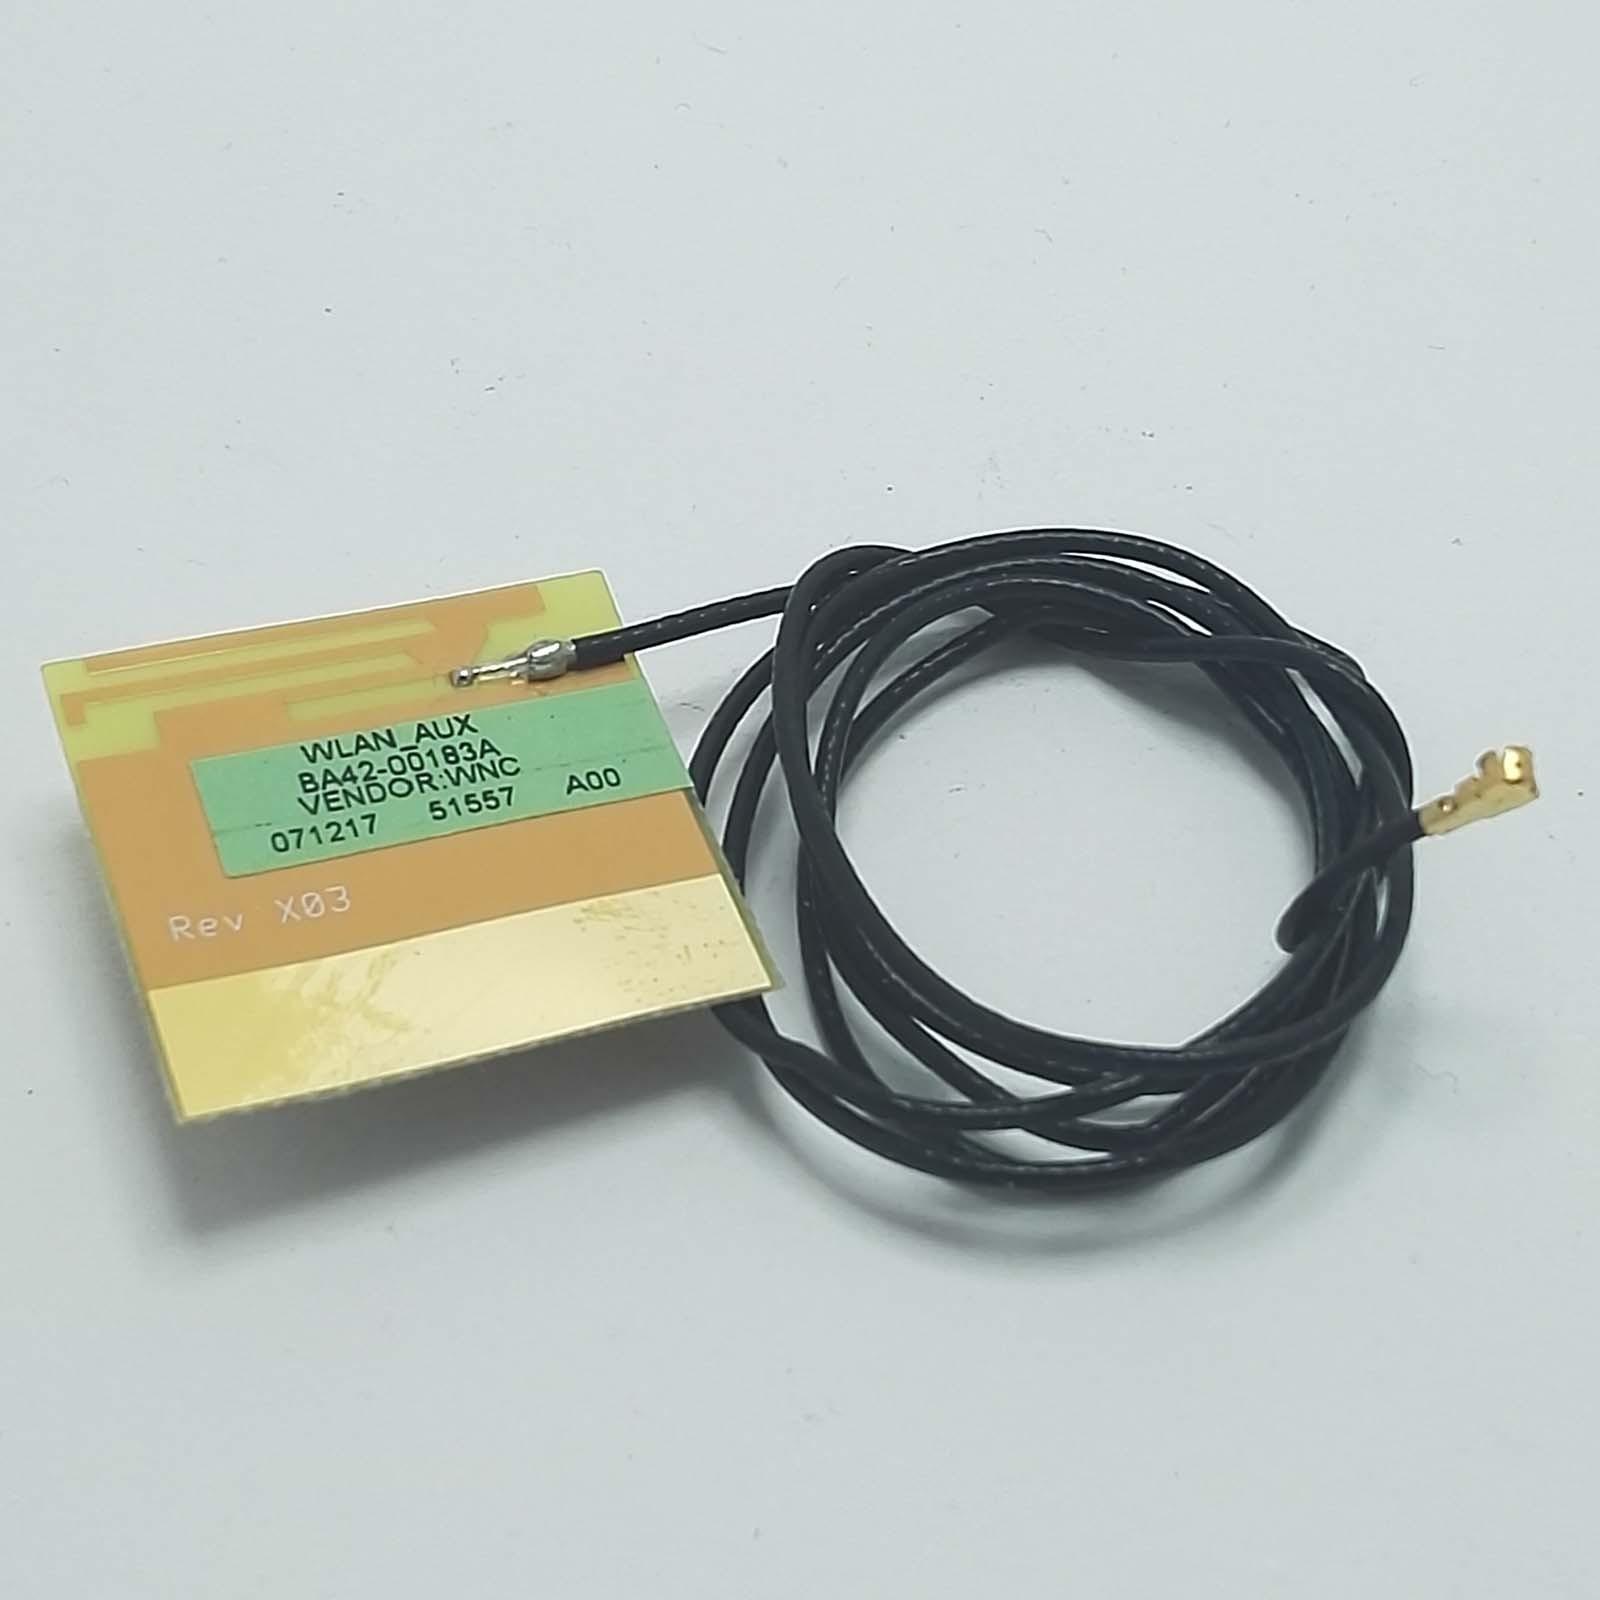 Antenna WiFi BA42-00183A Wlan AuxSamsung R60 Plus NP-R60S